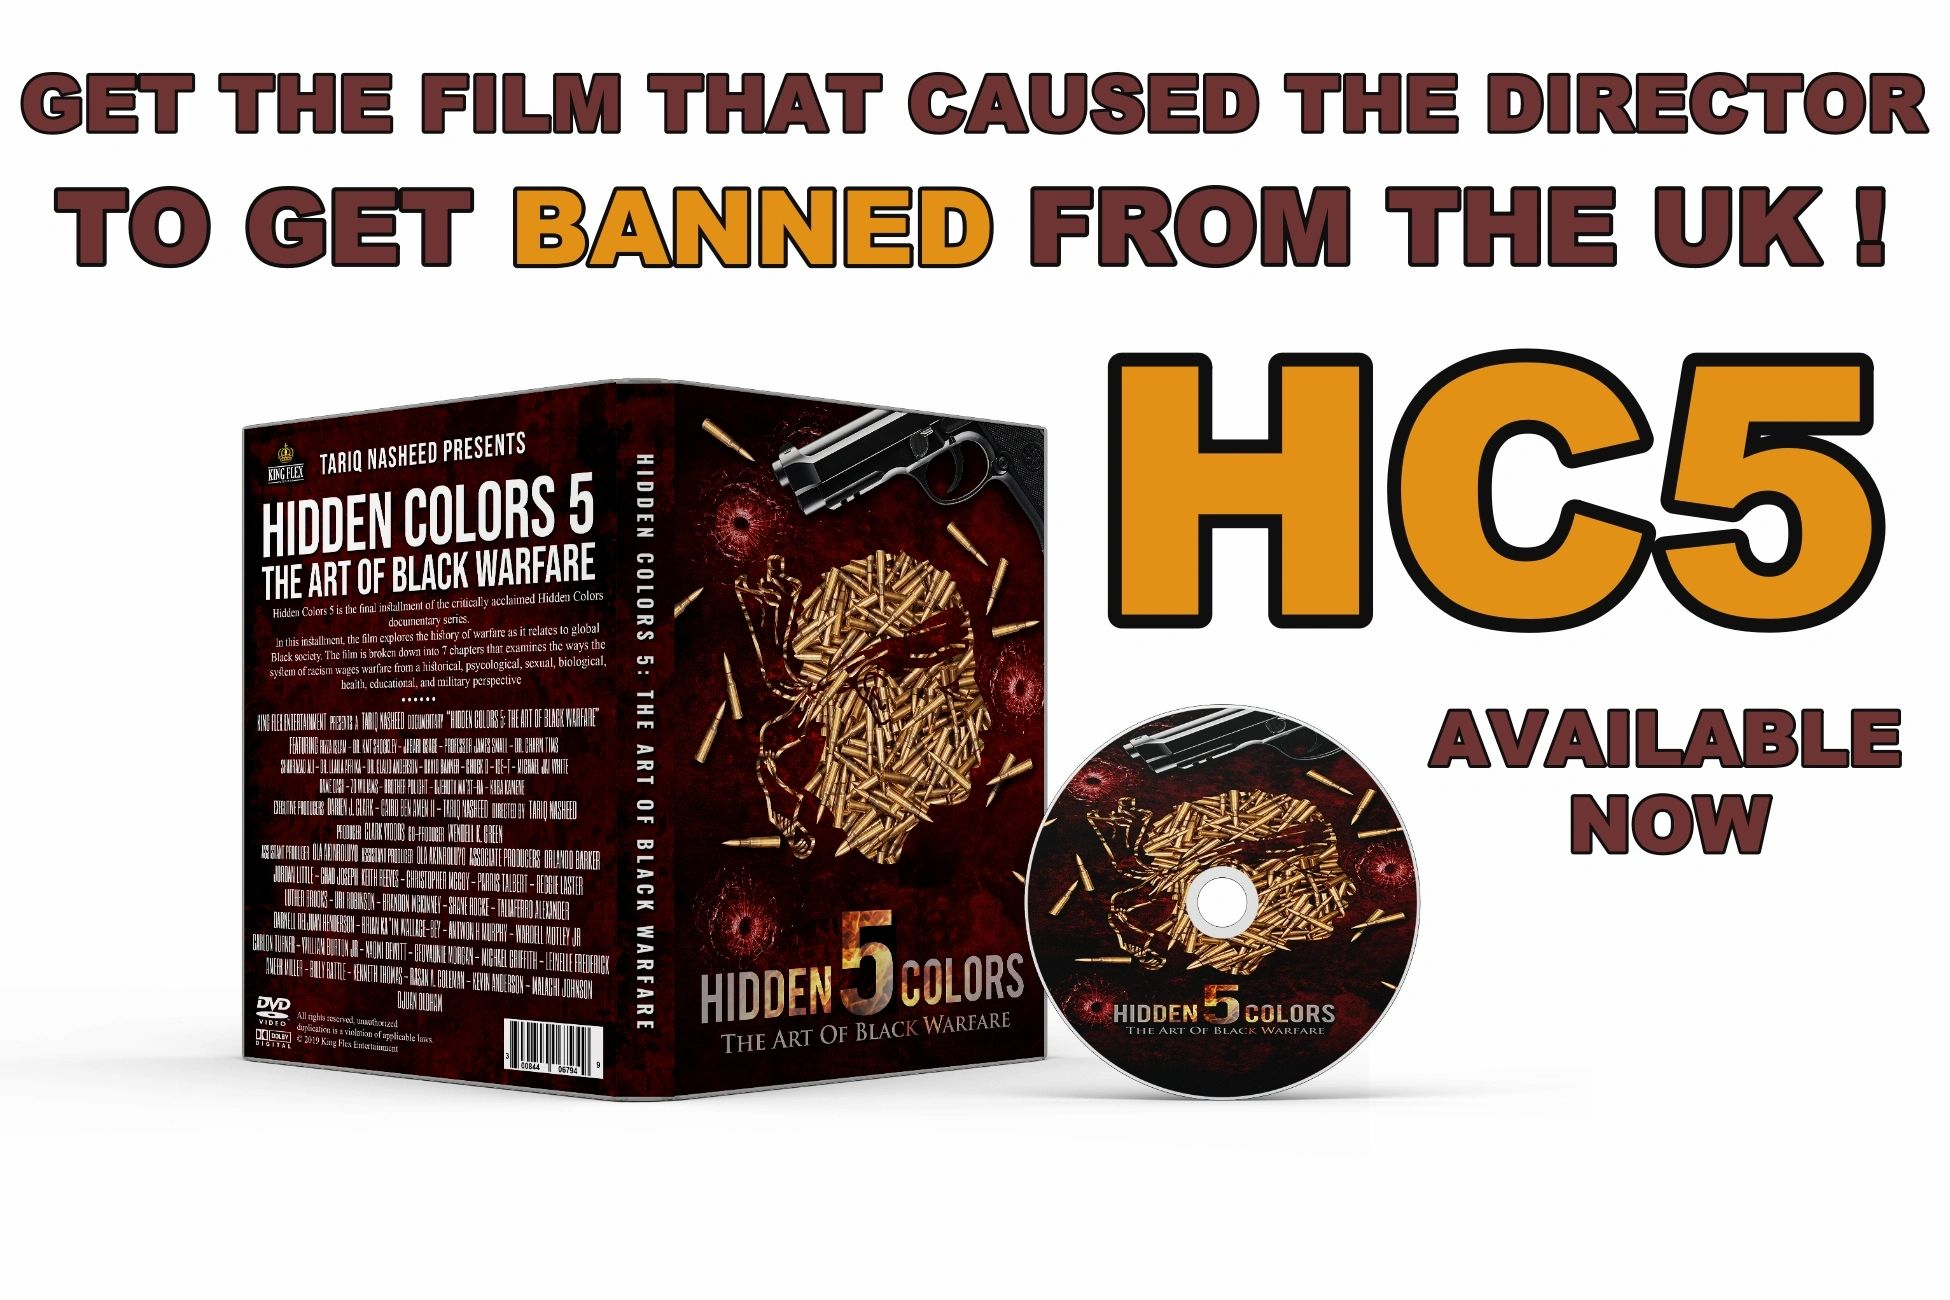 Hidden colours 5 free download pusat hobi.